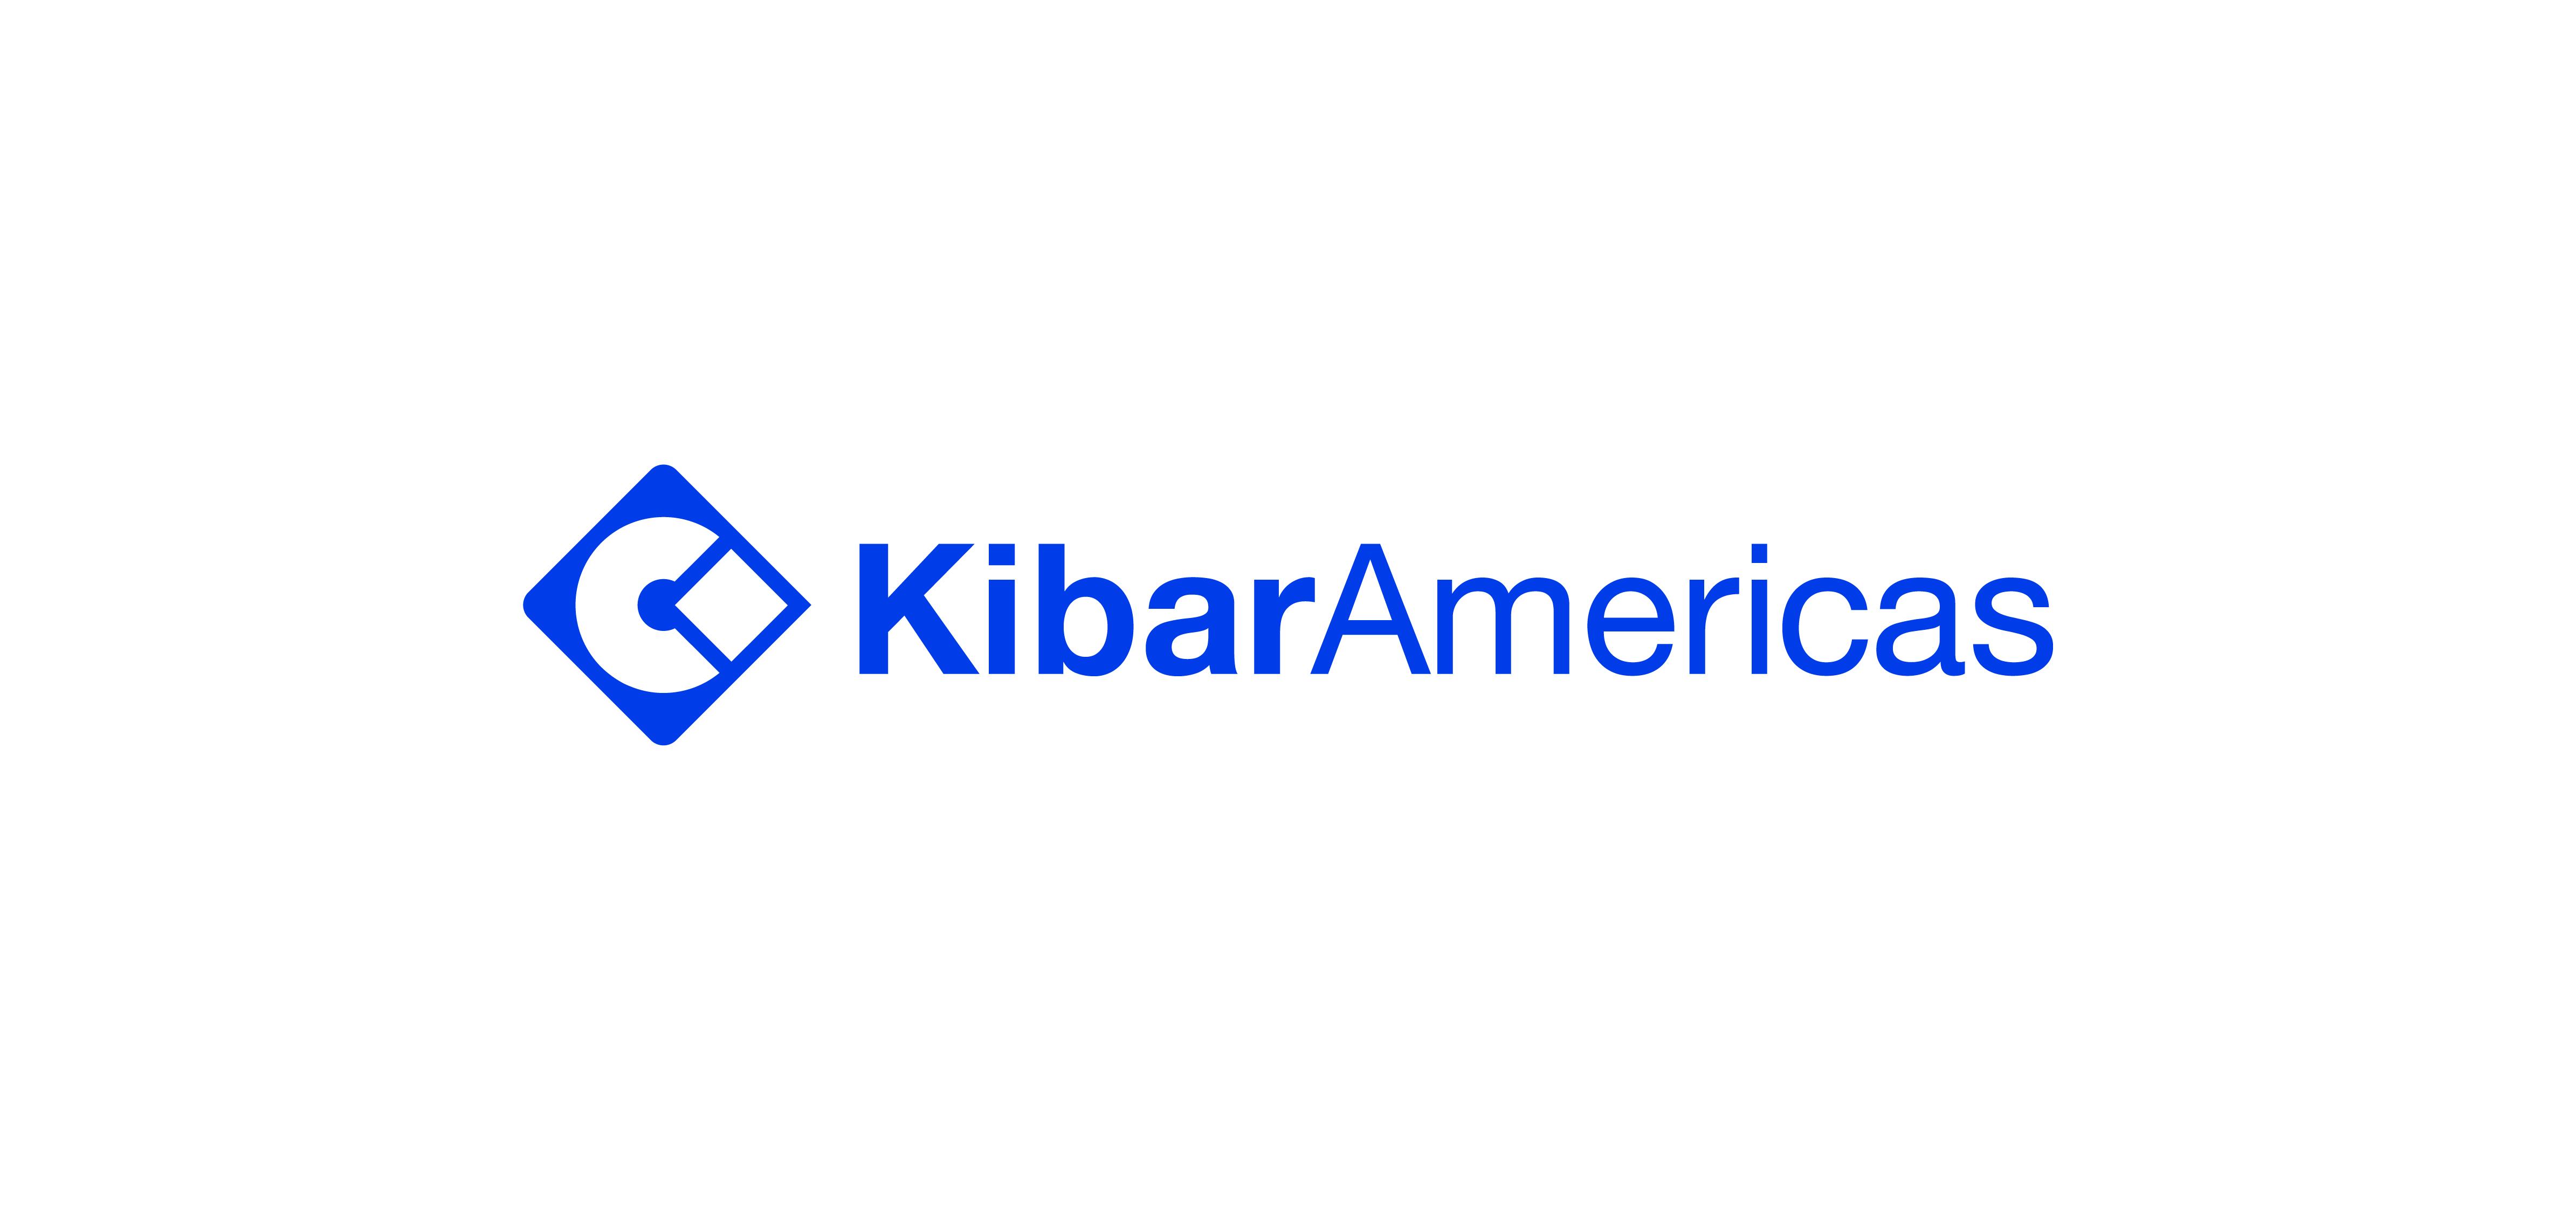 Kibar Americas